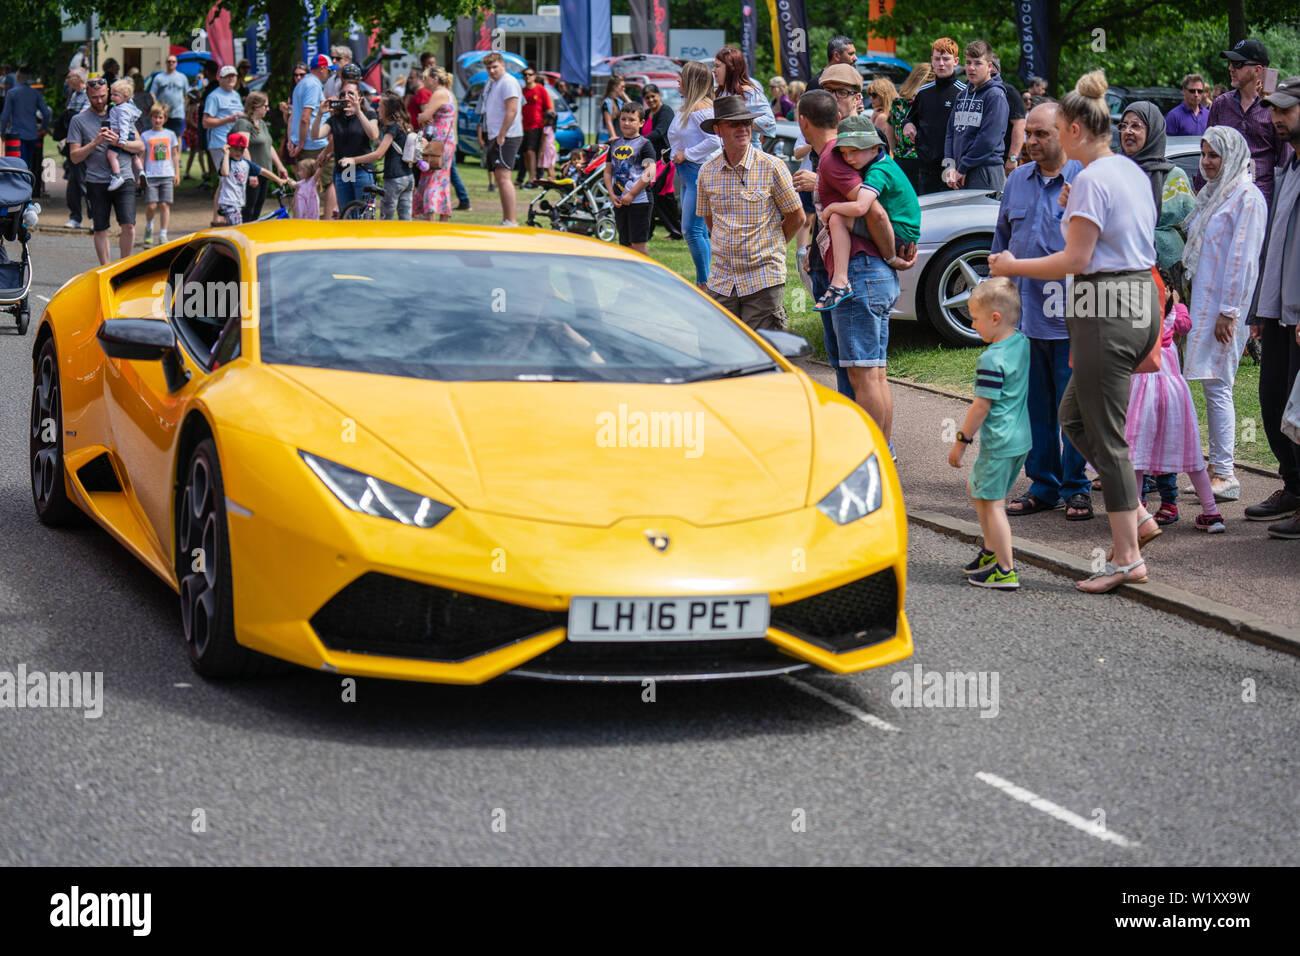 Bedford, Bedfordshire, UK. June 2, 2019. Fragment of yellow lamborghini Stock Photo